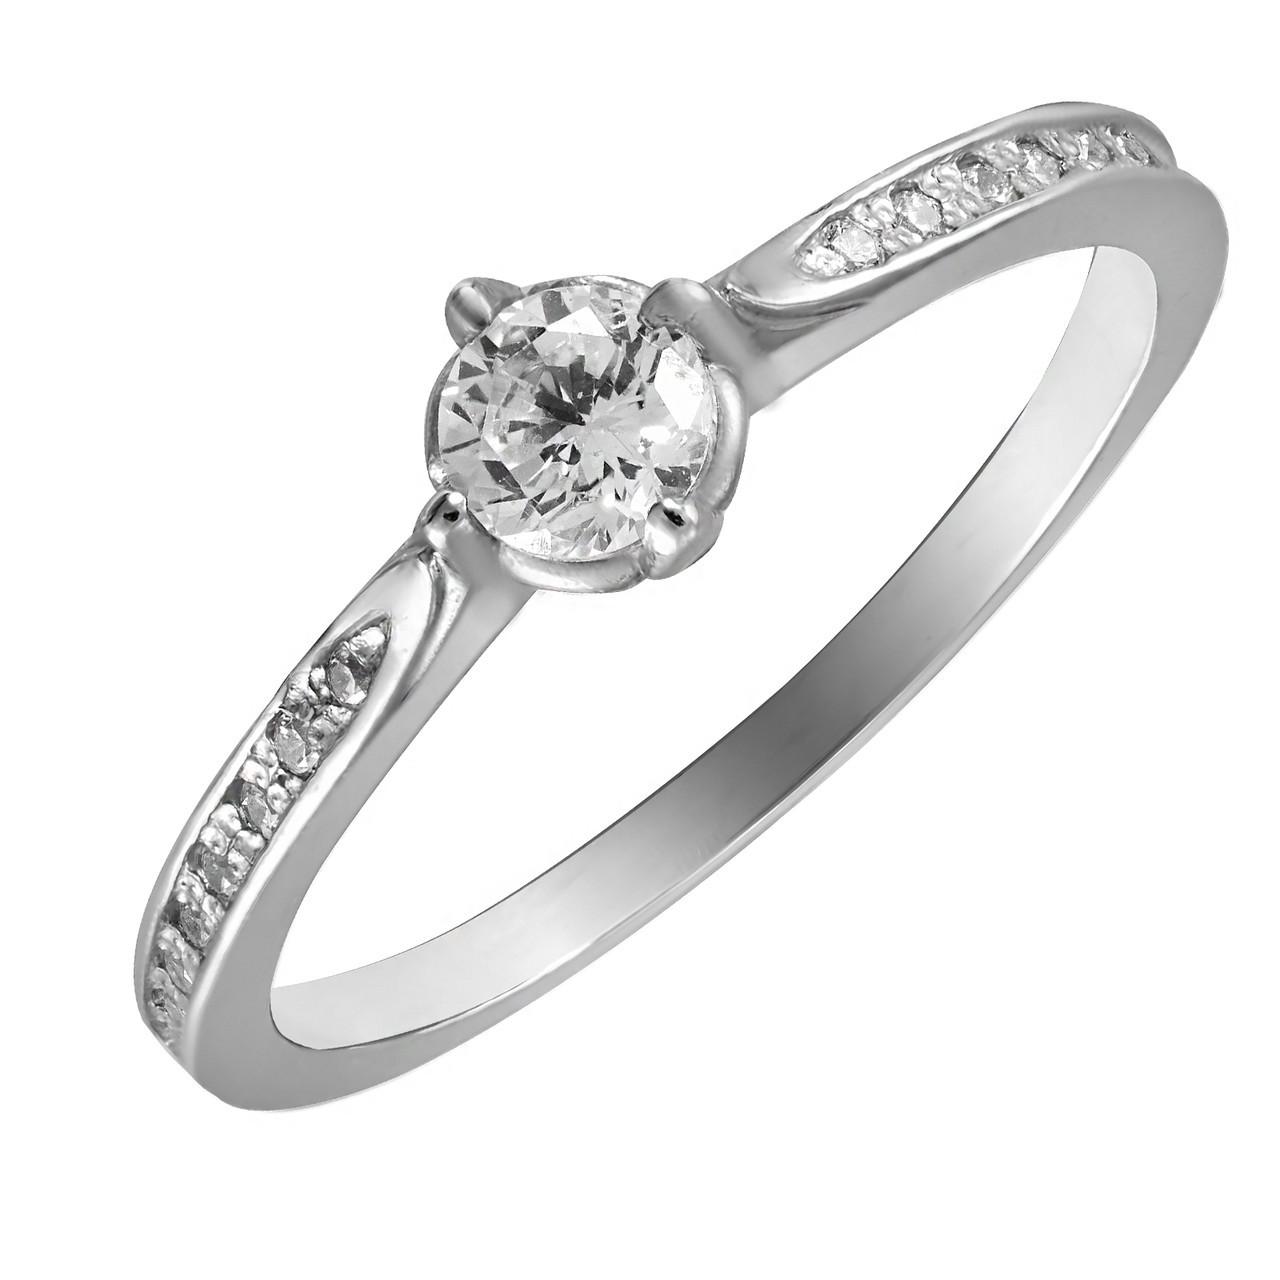 Кольцо из серебра с циркониями Twiddle Jewelry 18.5 (К009-18.5)